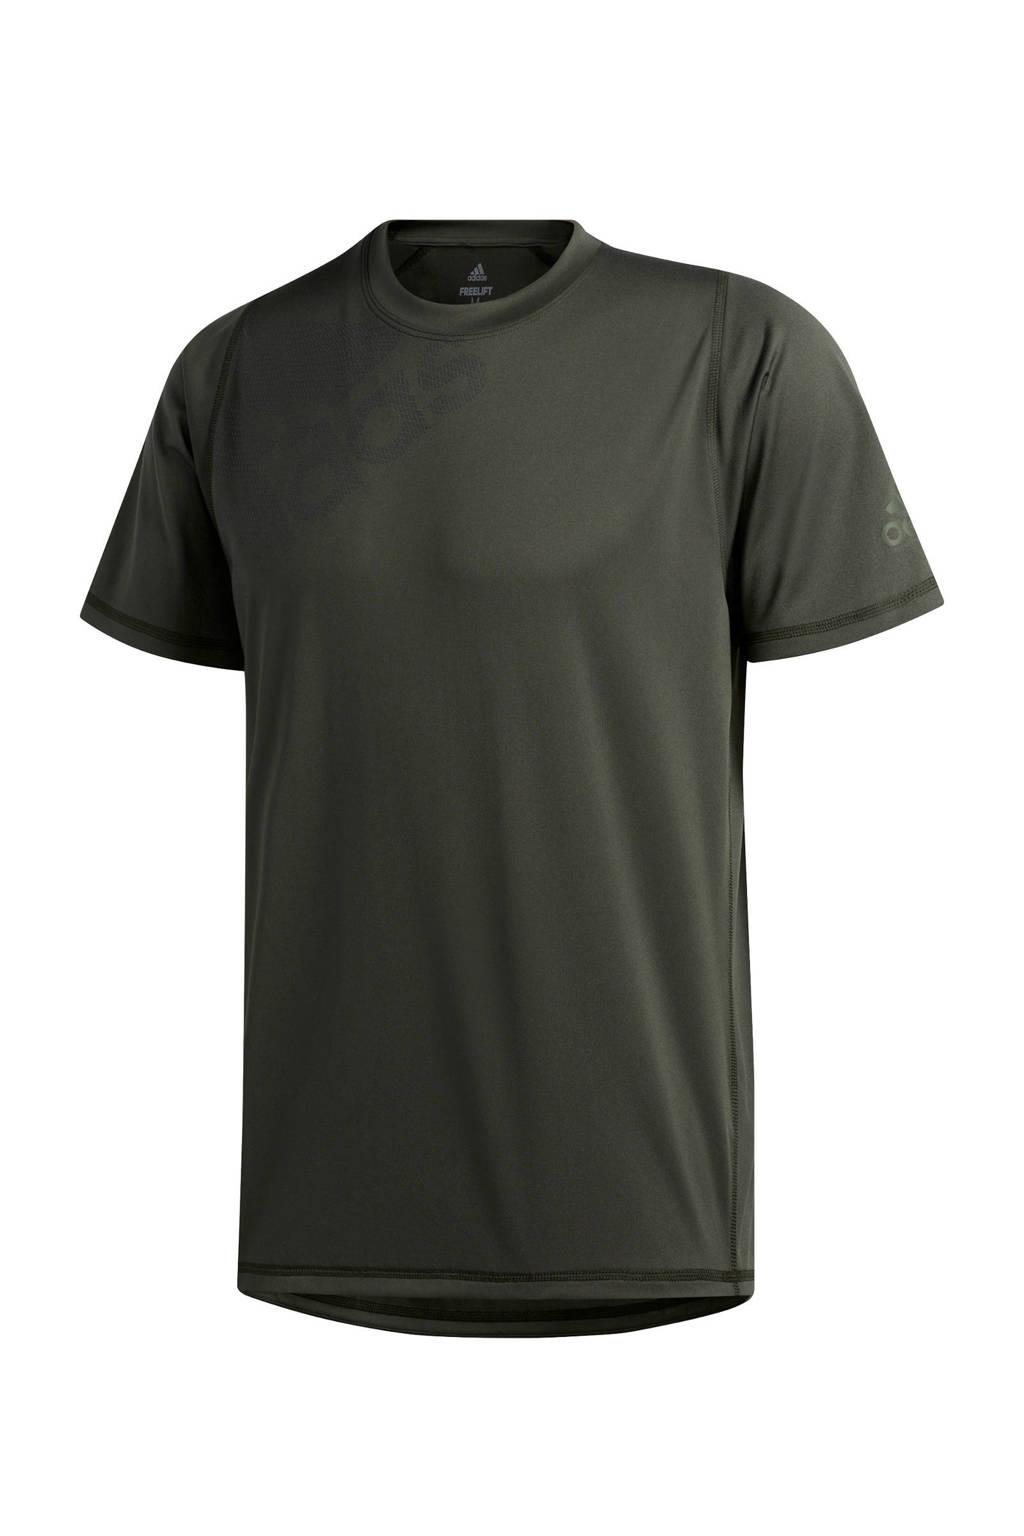 adidas Performance   sport T-shirt donkergroen, Donkergroen